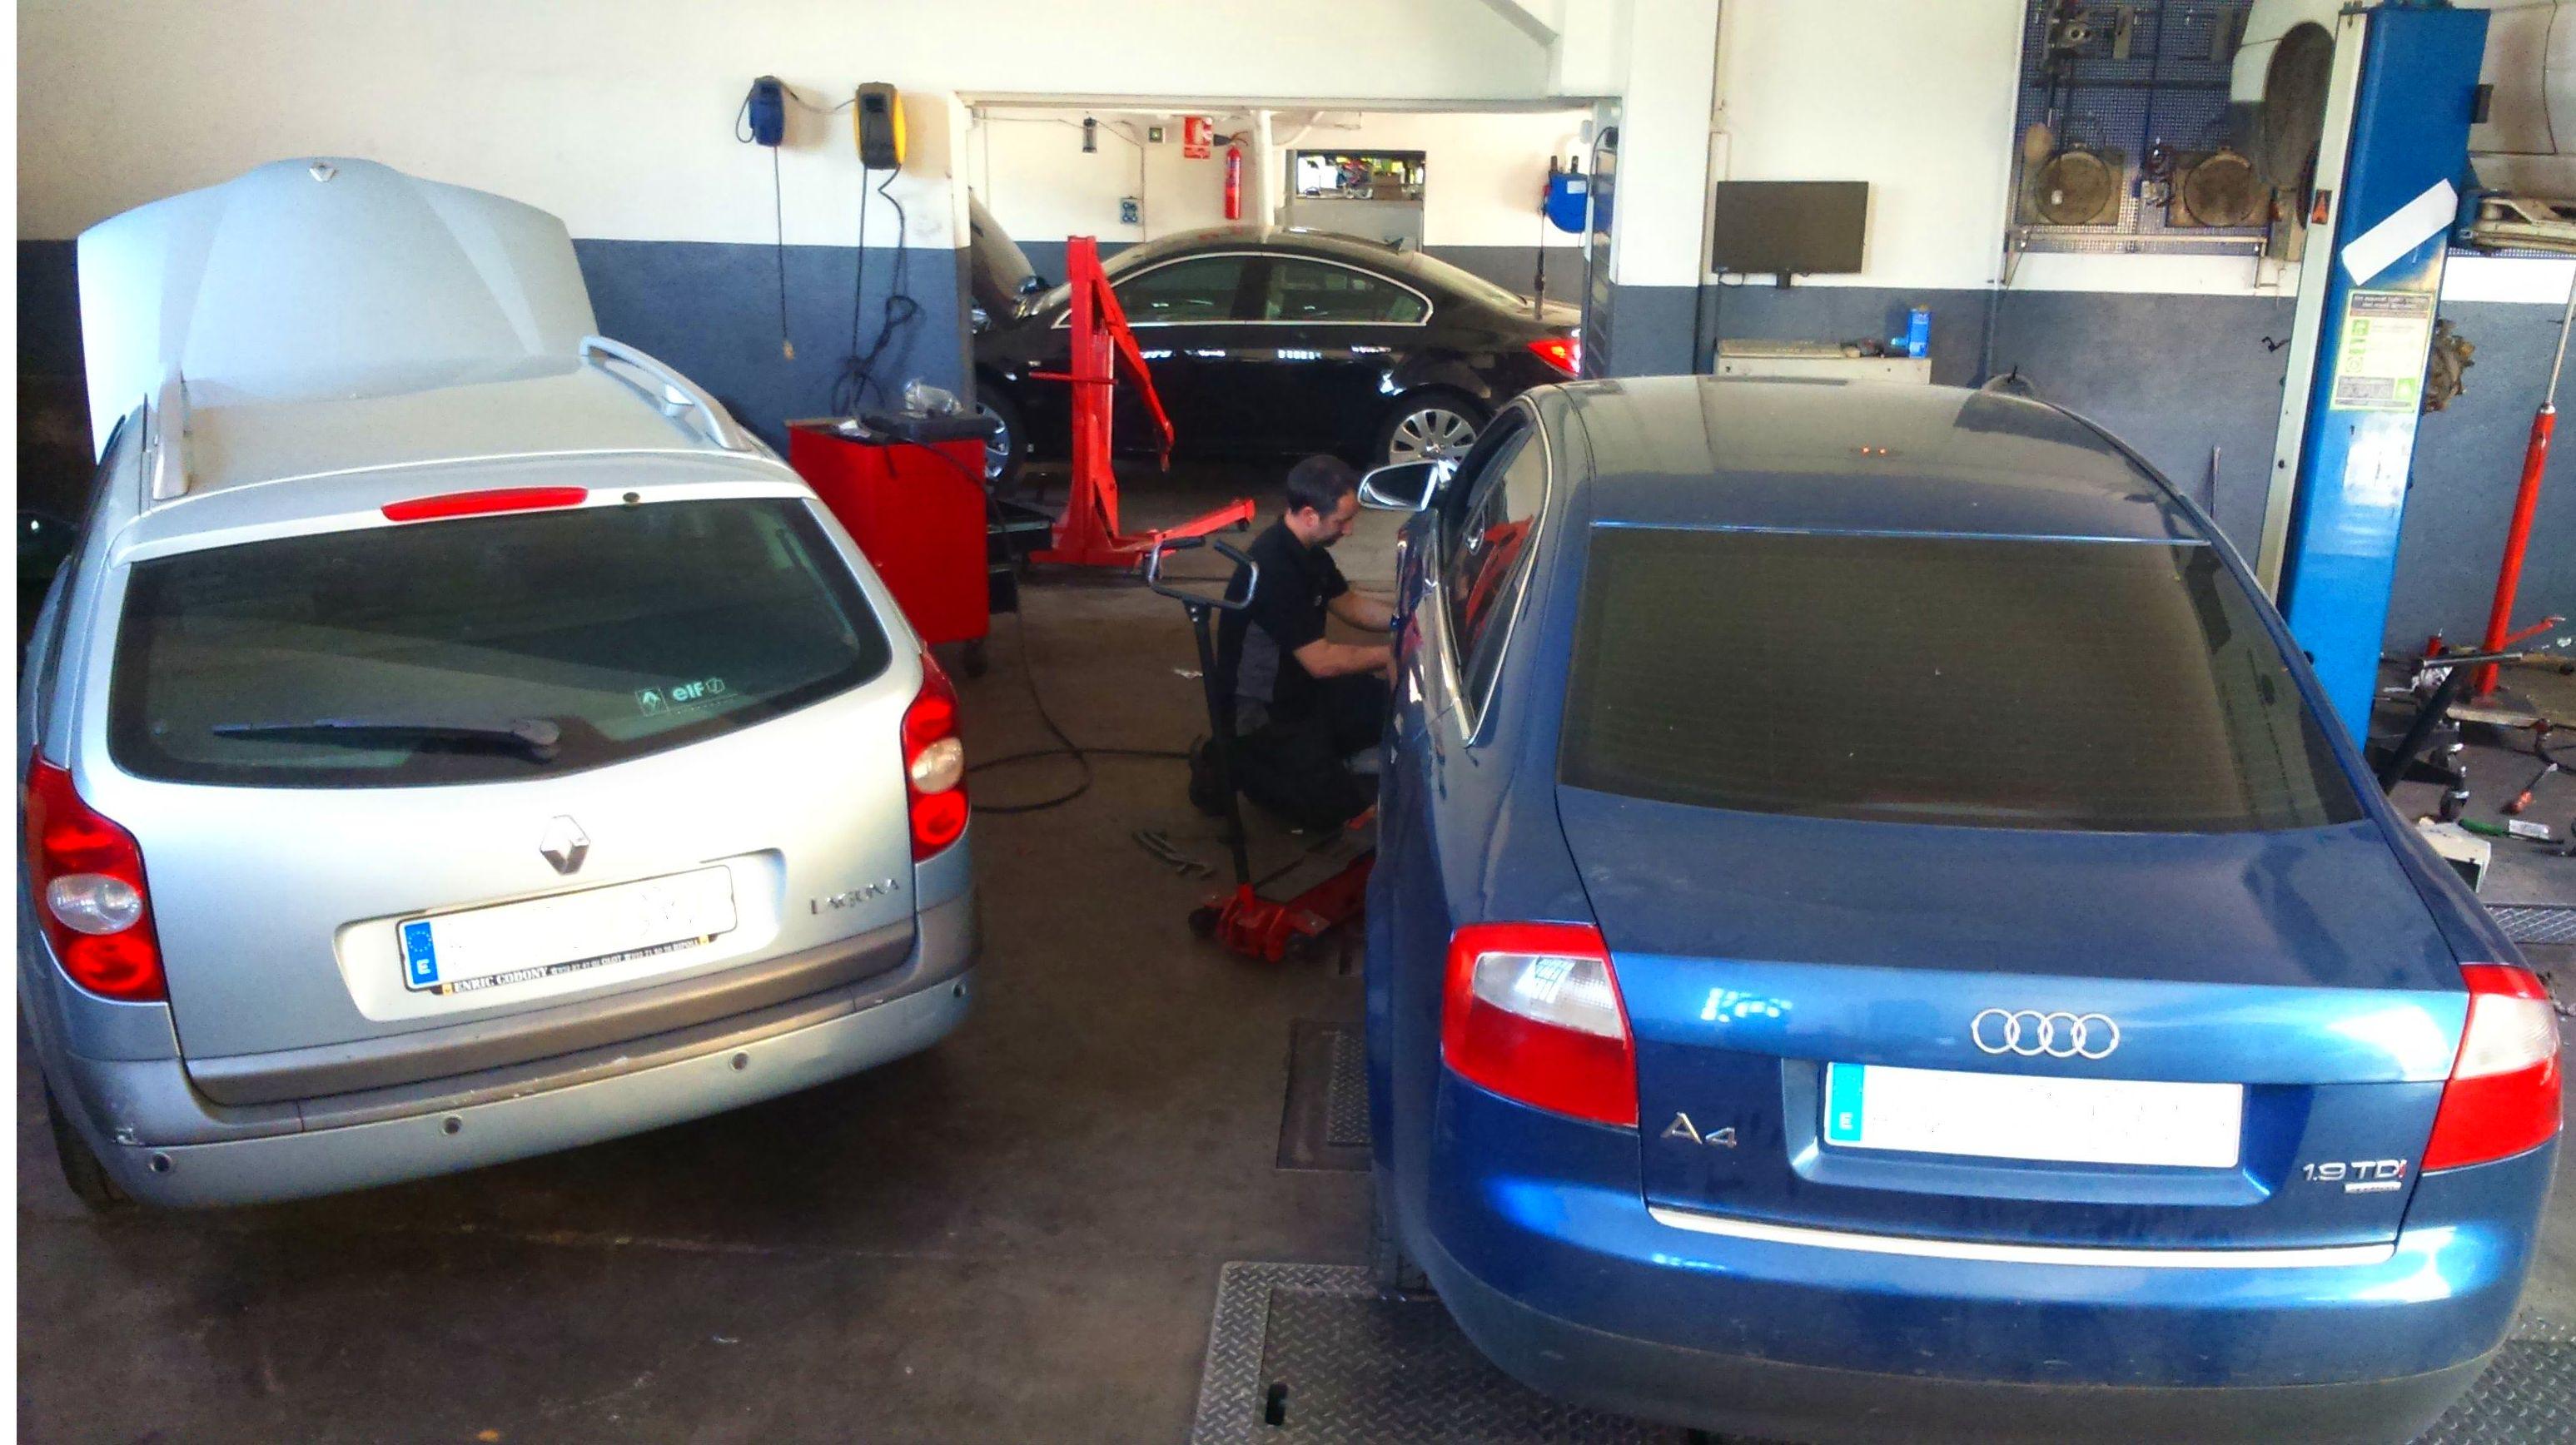 Foto 39 de Talleres de automóviles en La Cellera de Ter | Taller Mecànic Moreevolution